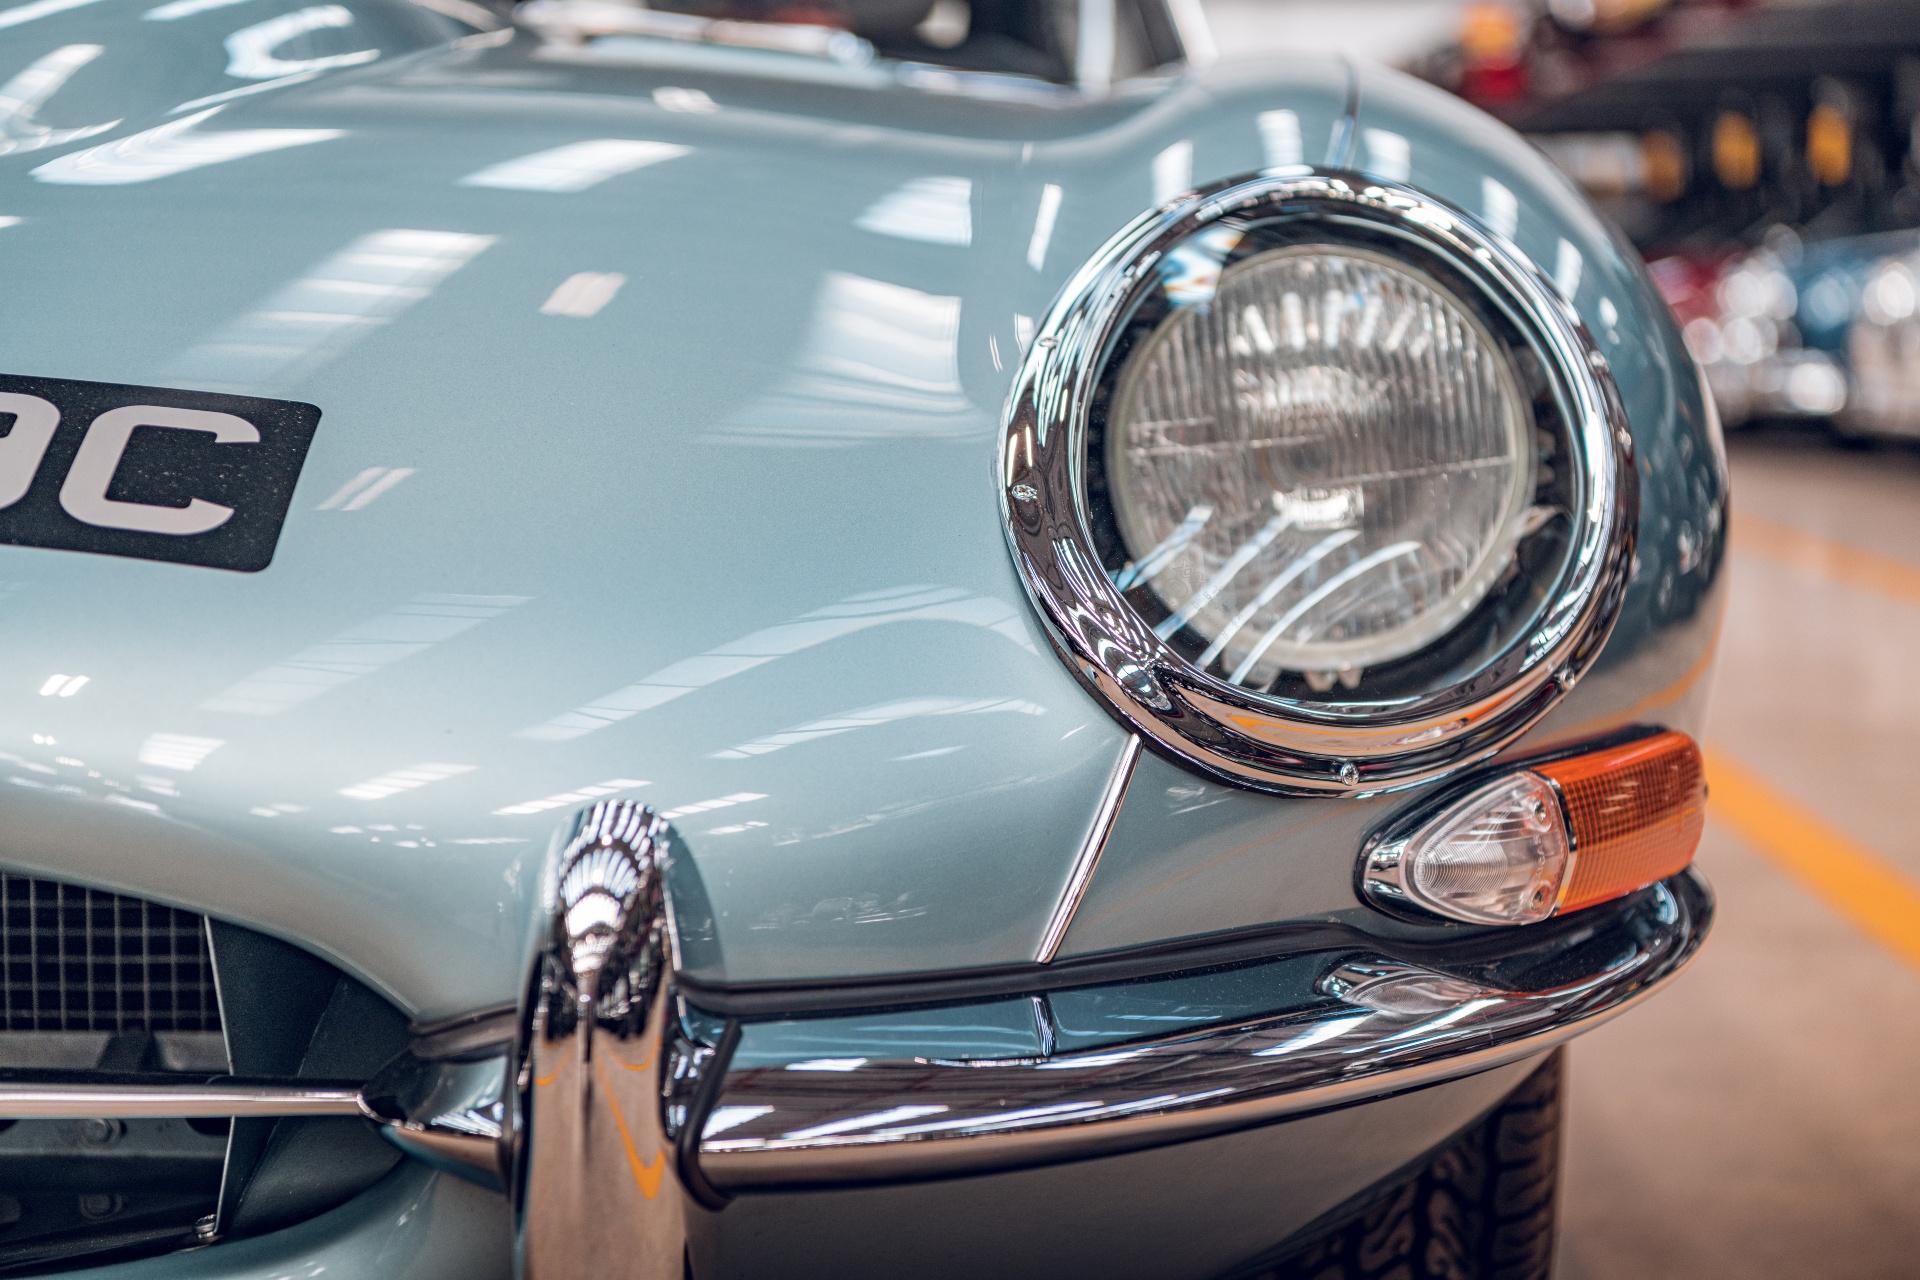 Jaguar E-Type Reborn 1965 Series 1 4.2 headlight detail